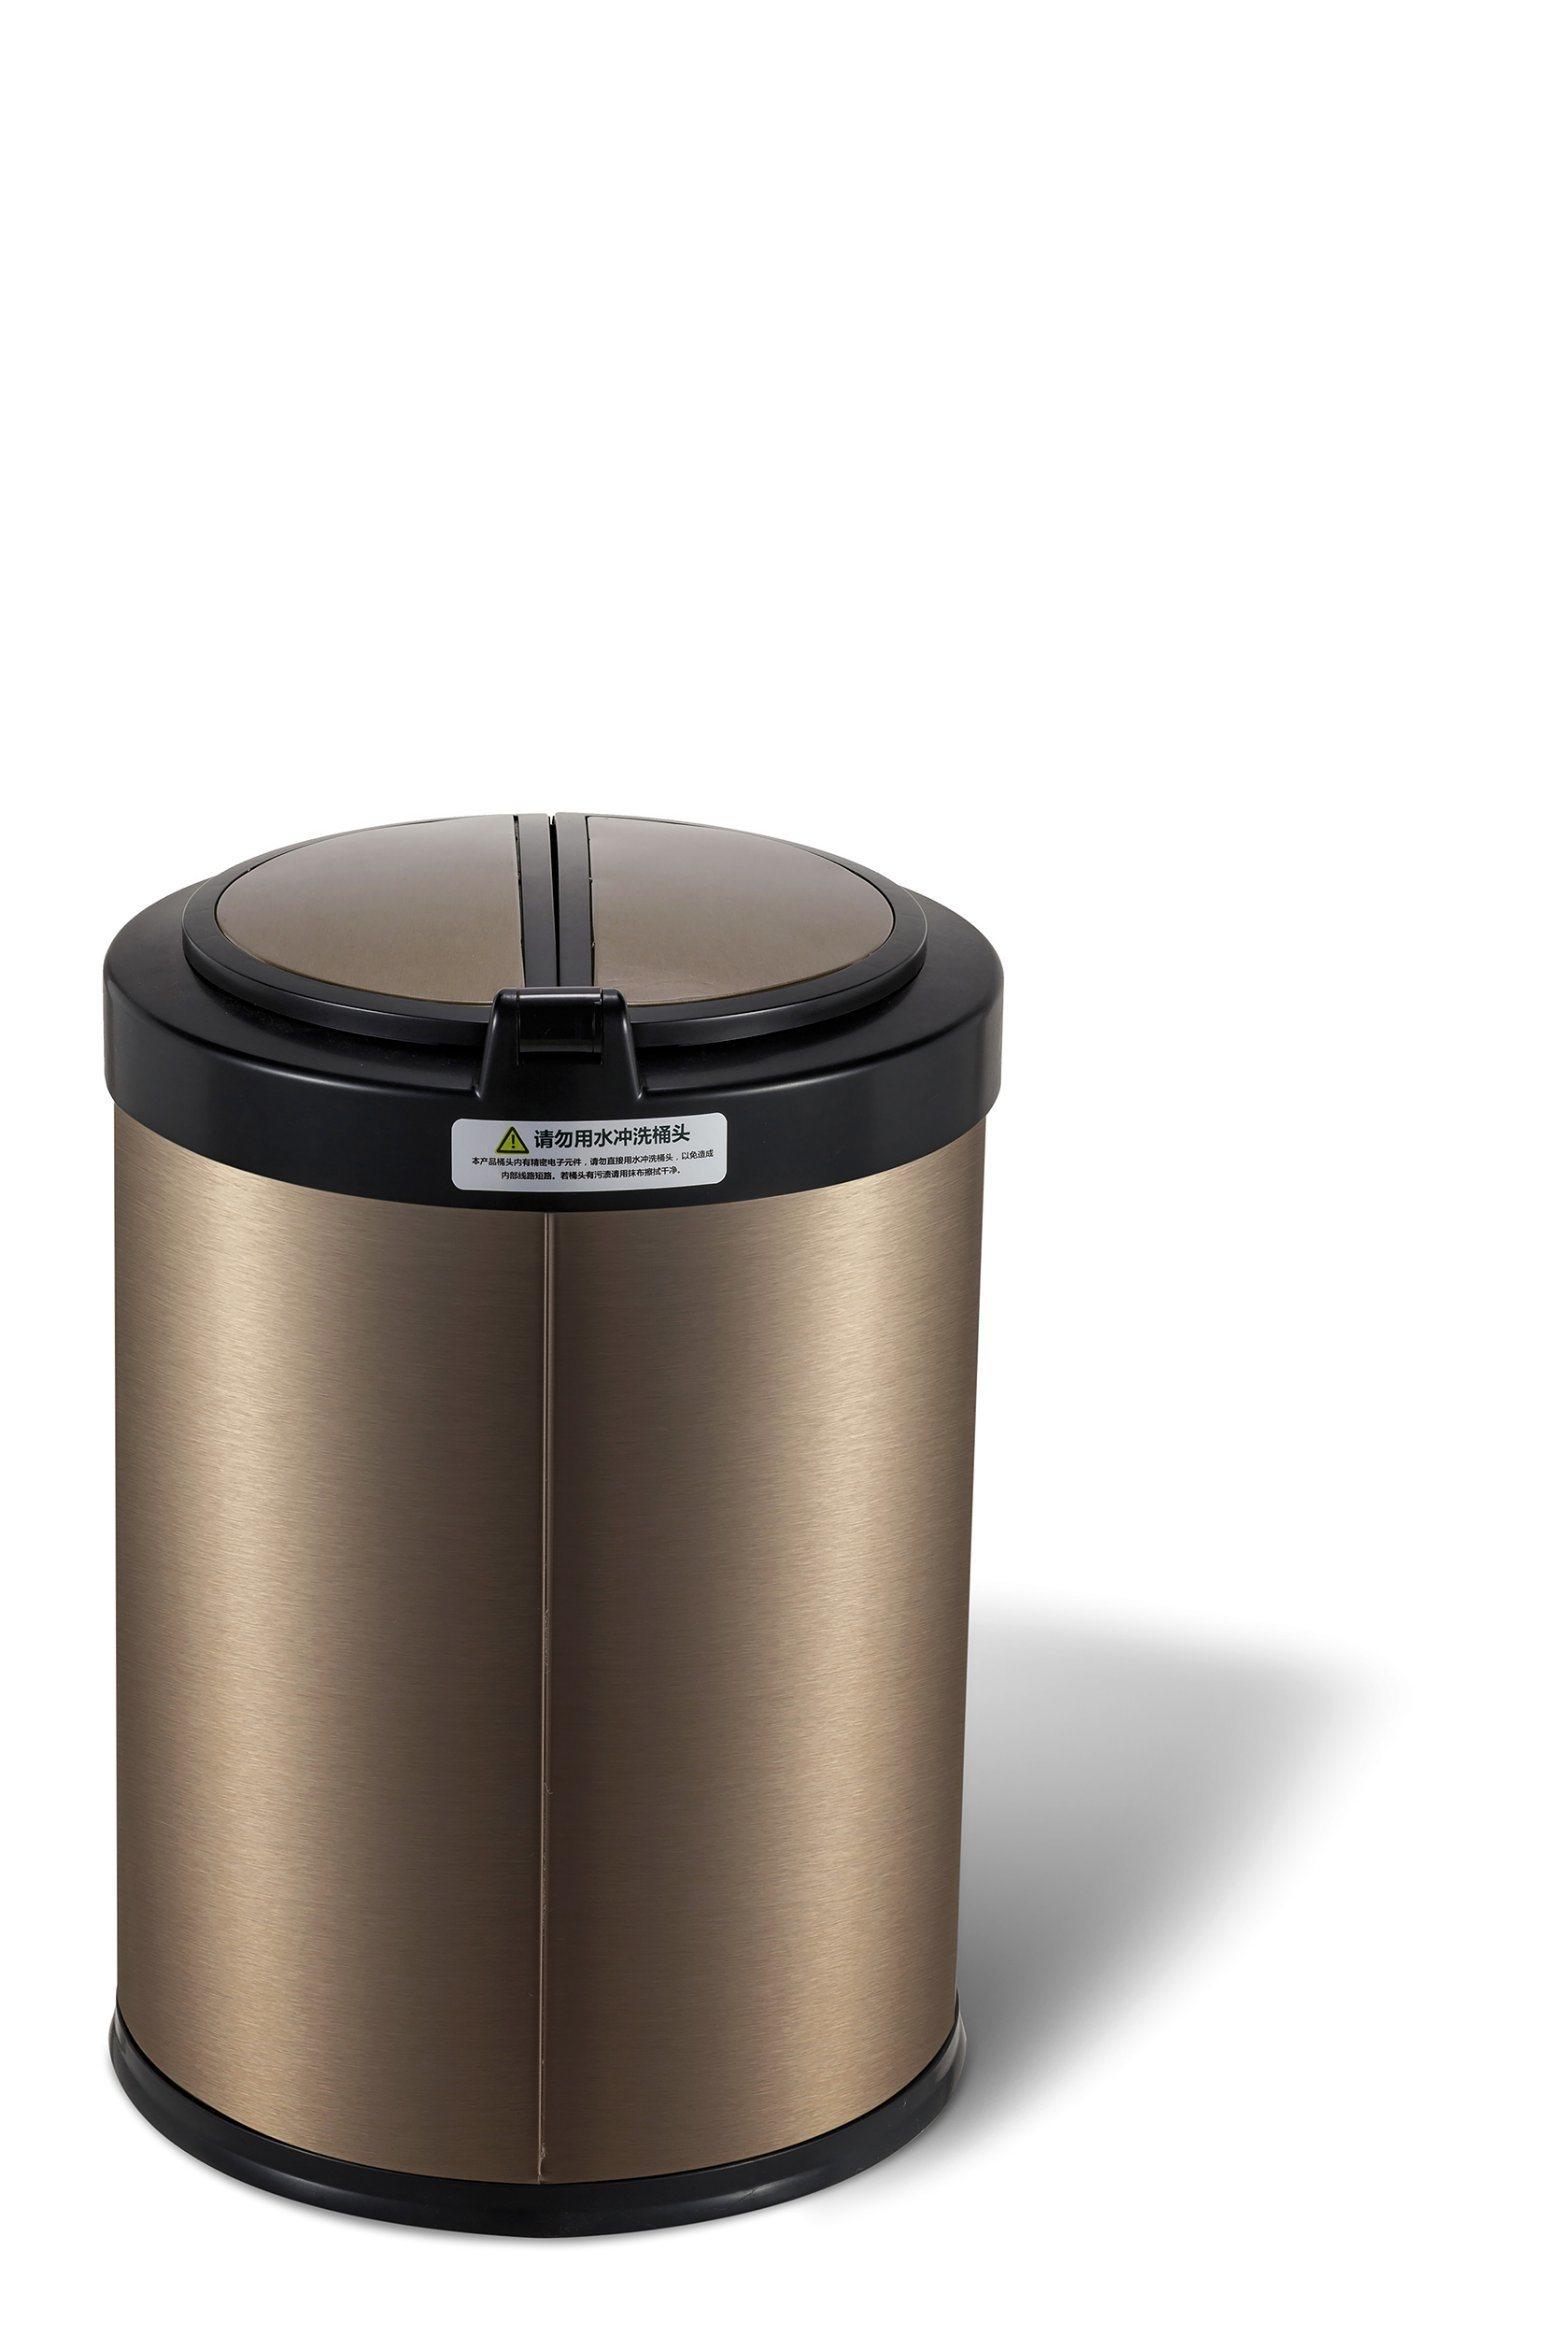 [Hot Item] Wholesale Modern Home Decor, Super Quality Intelligent Trash Can